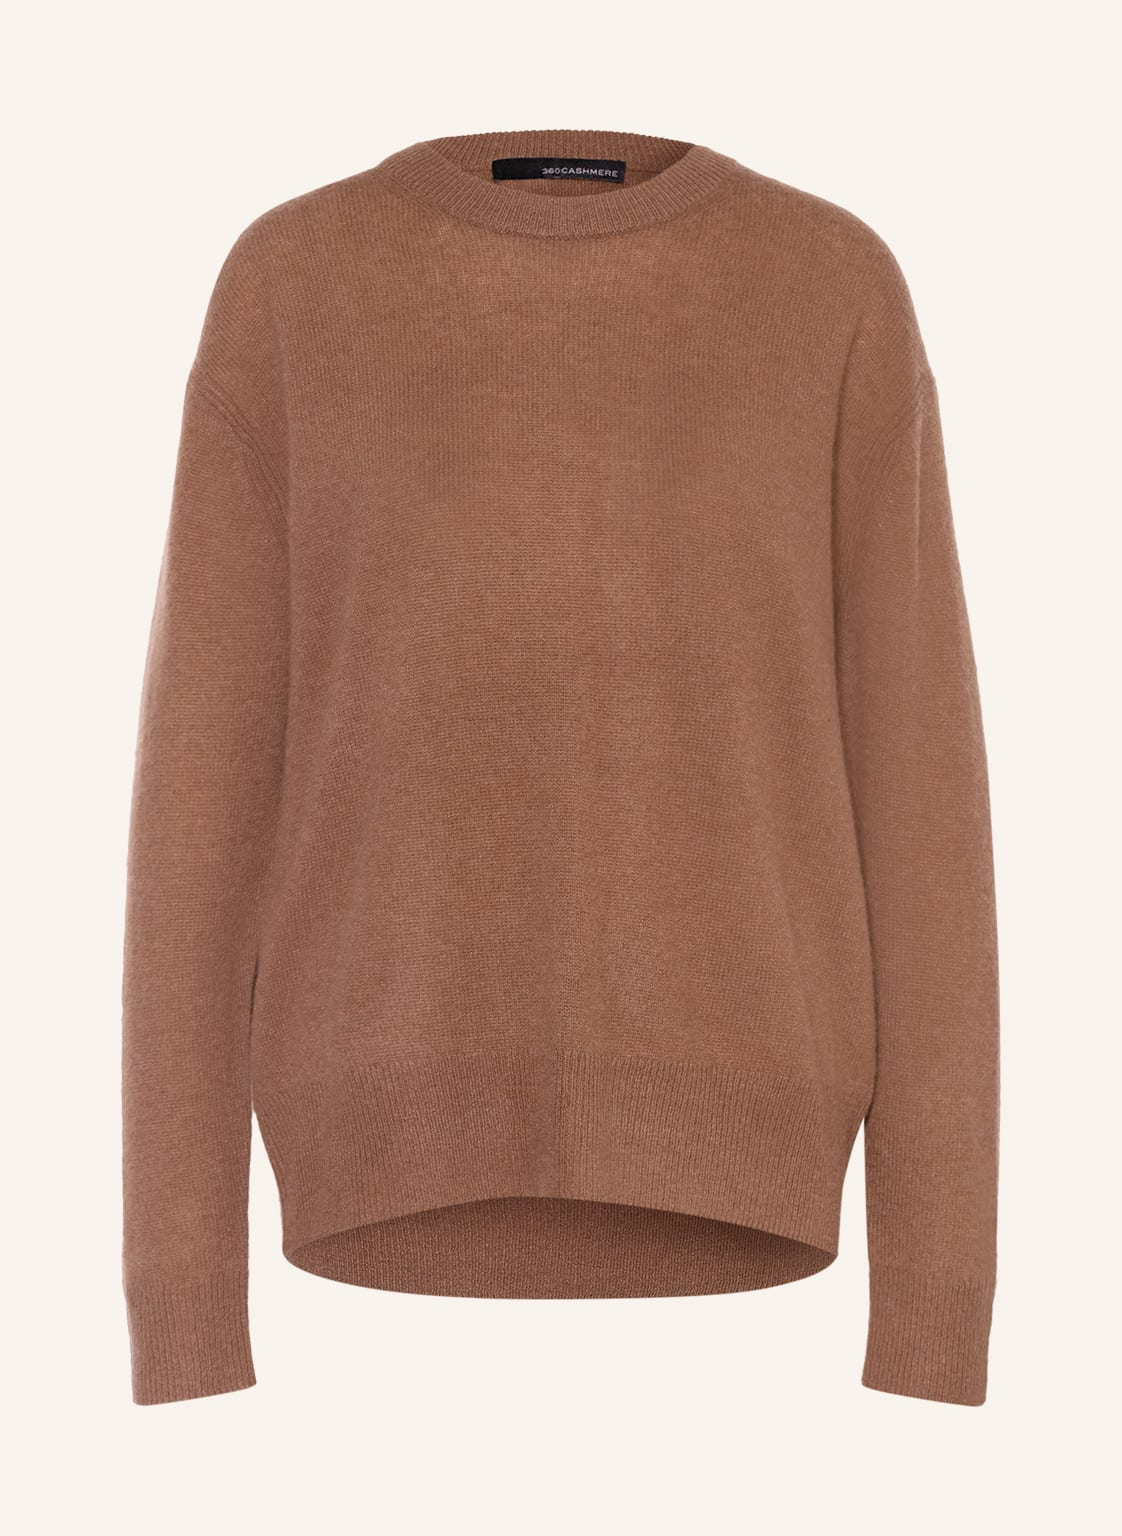 Image of 360cashmere Cashmere-Pullover Daphne braun